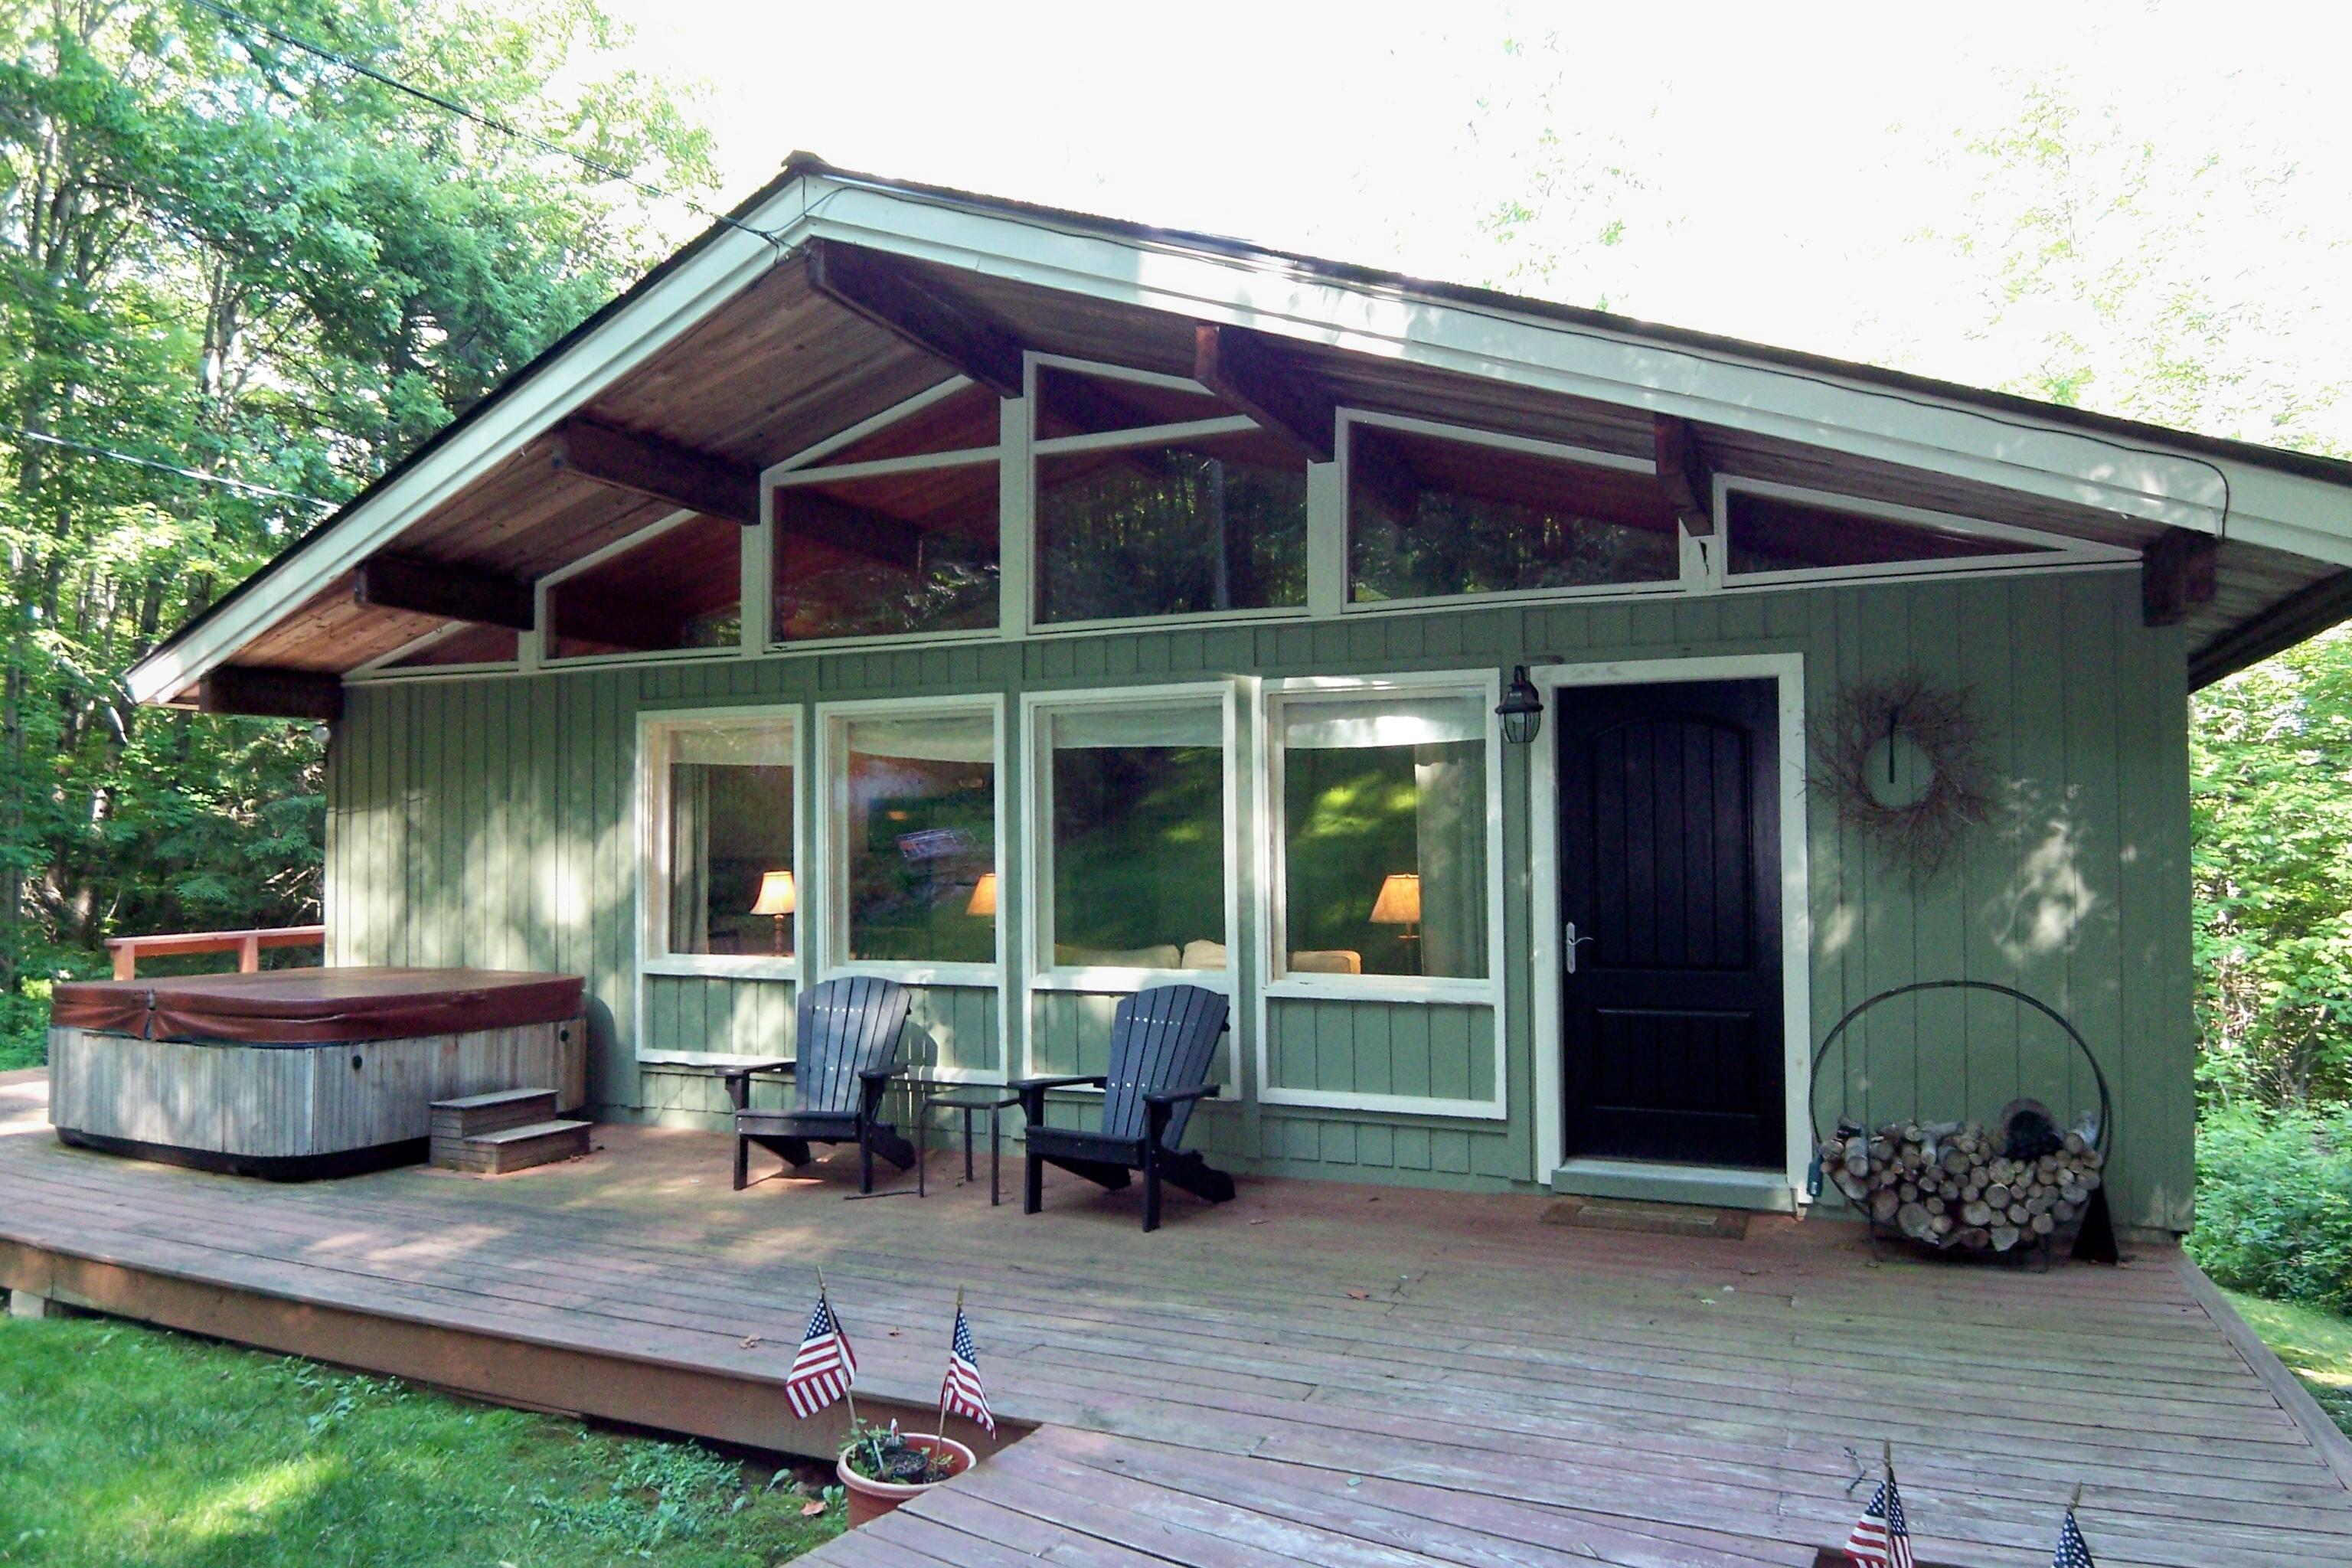 獨棟家庭住宅 為 出售 在 Affordable Chalet 20 Pine Drive (m922) Wilmington, 佛蒙特州, 05363 美國